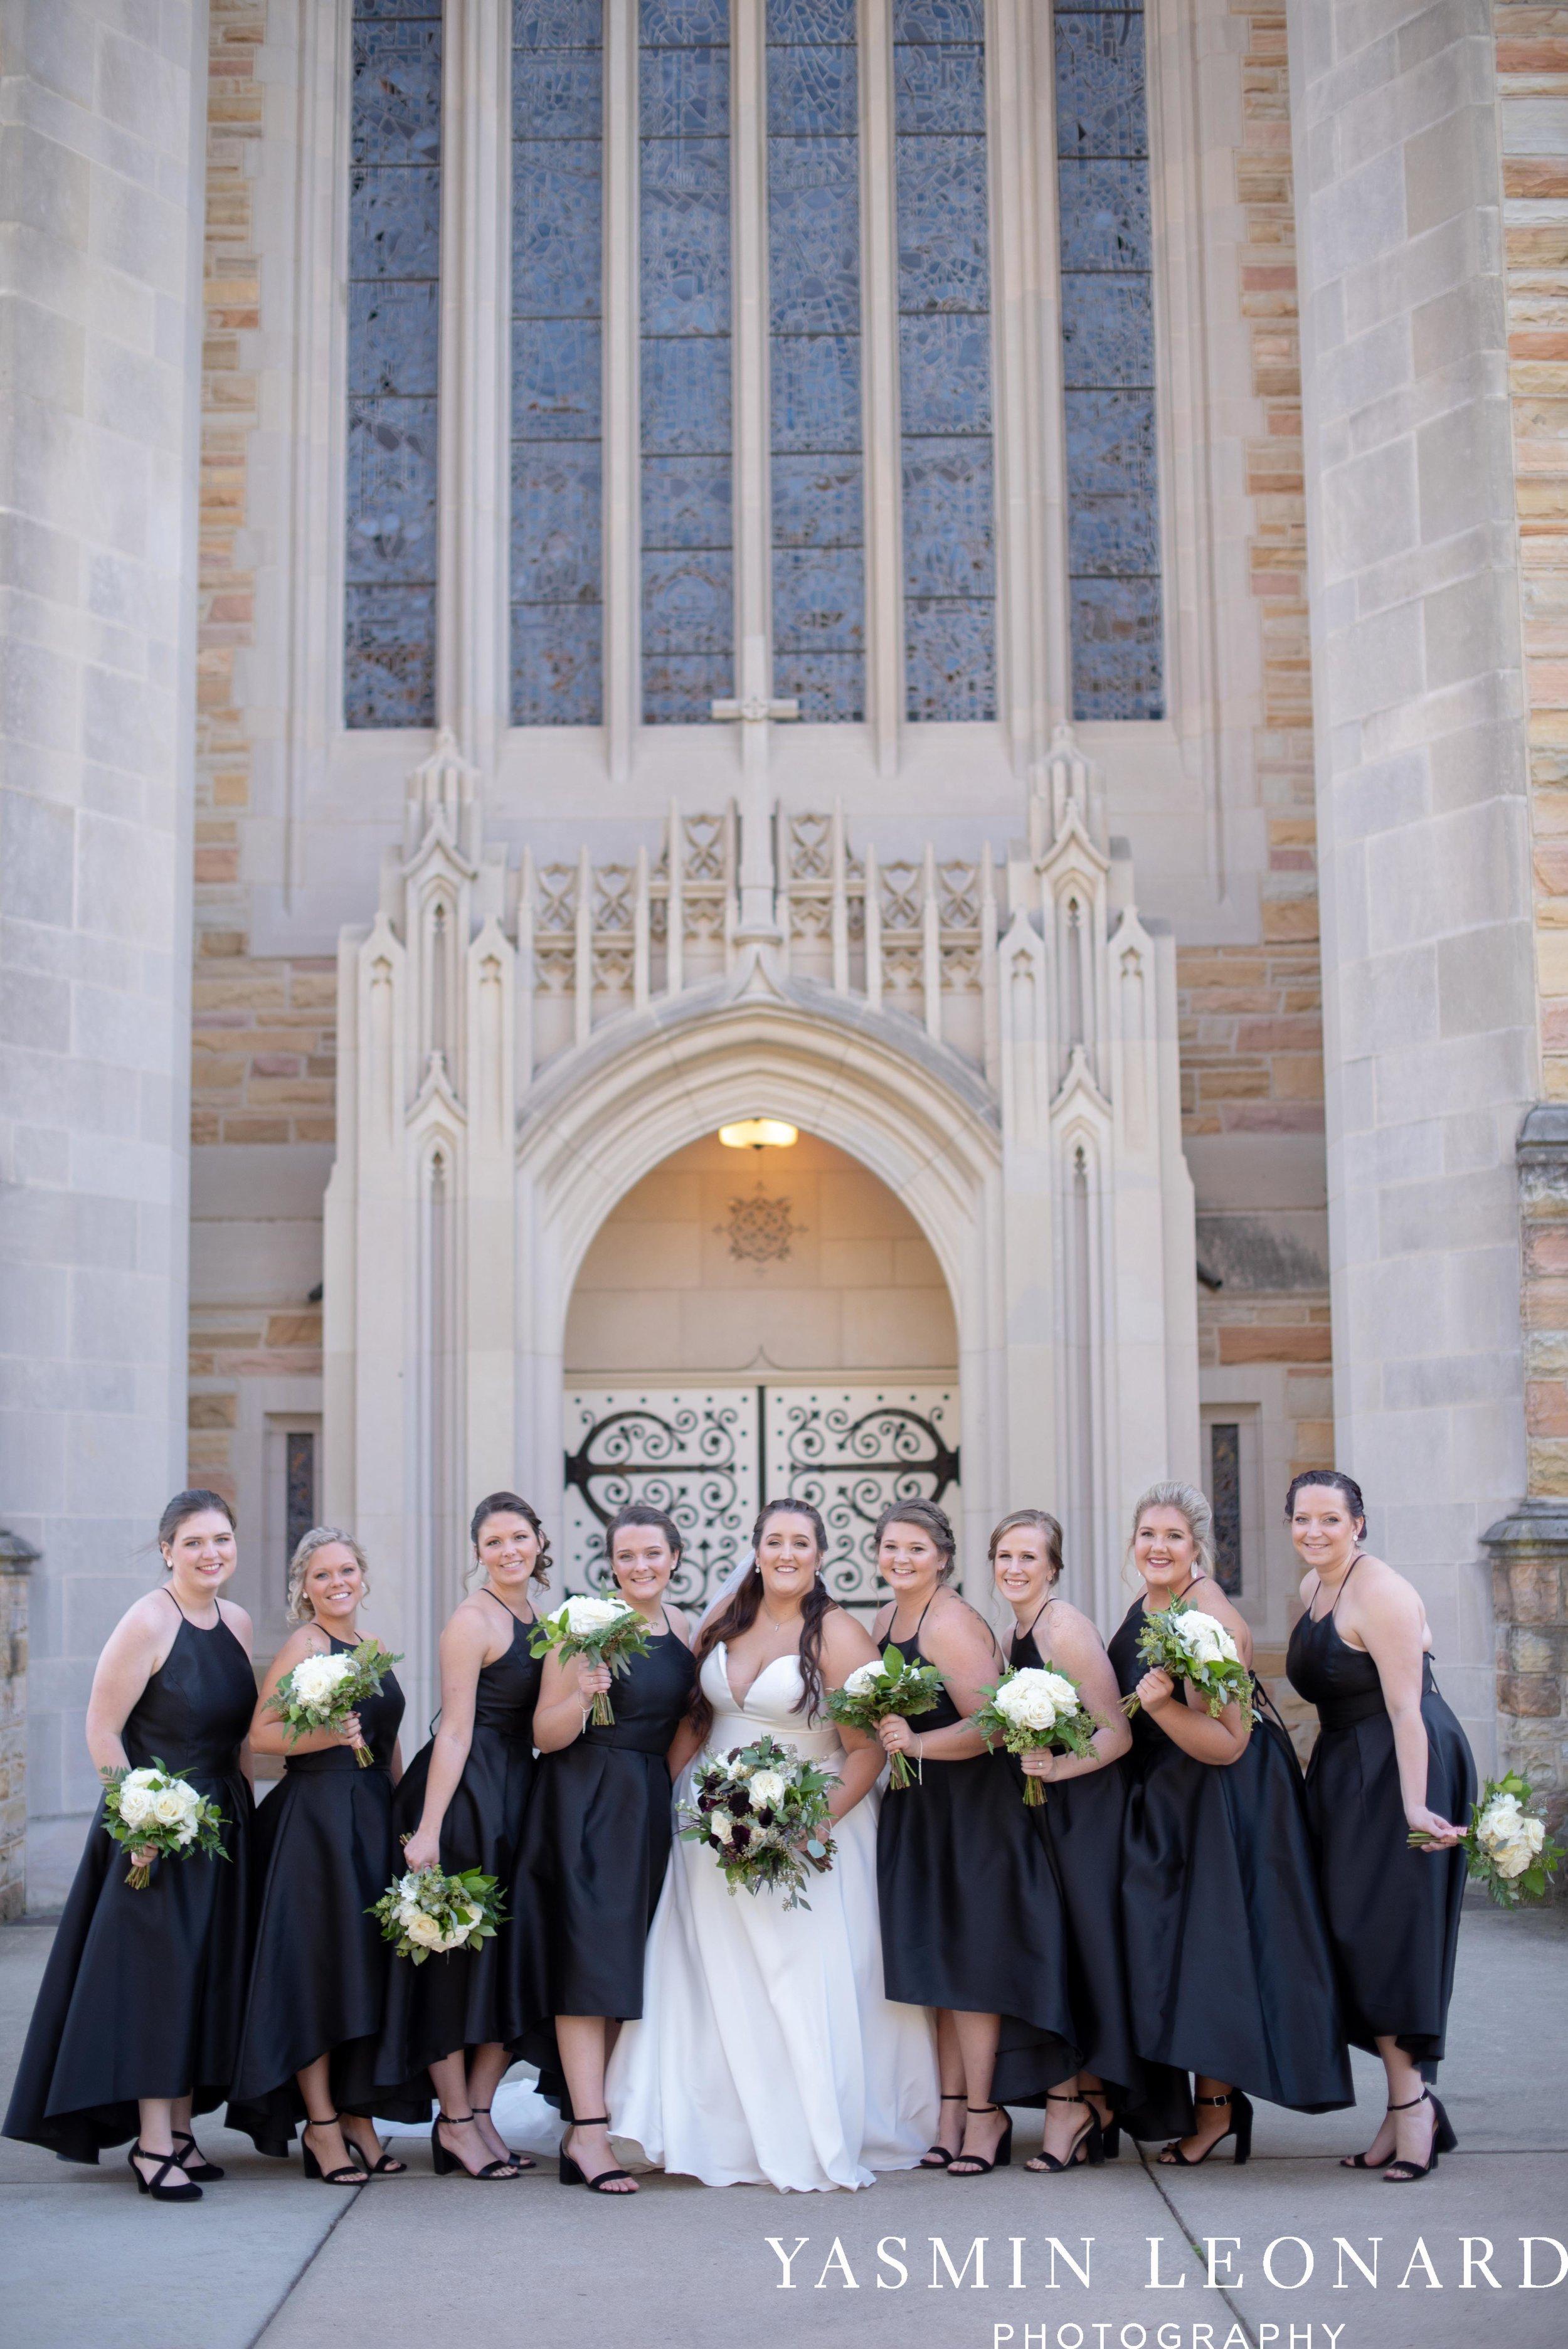 Wesley Memorial United Methodist Church - Old Homeplace Winery - High Point Weddings - High Point Wedding Photographer - NC Weddings - NC Barn Venue - Yasmin Leonard Photography-7.jpg